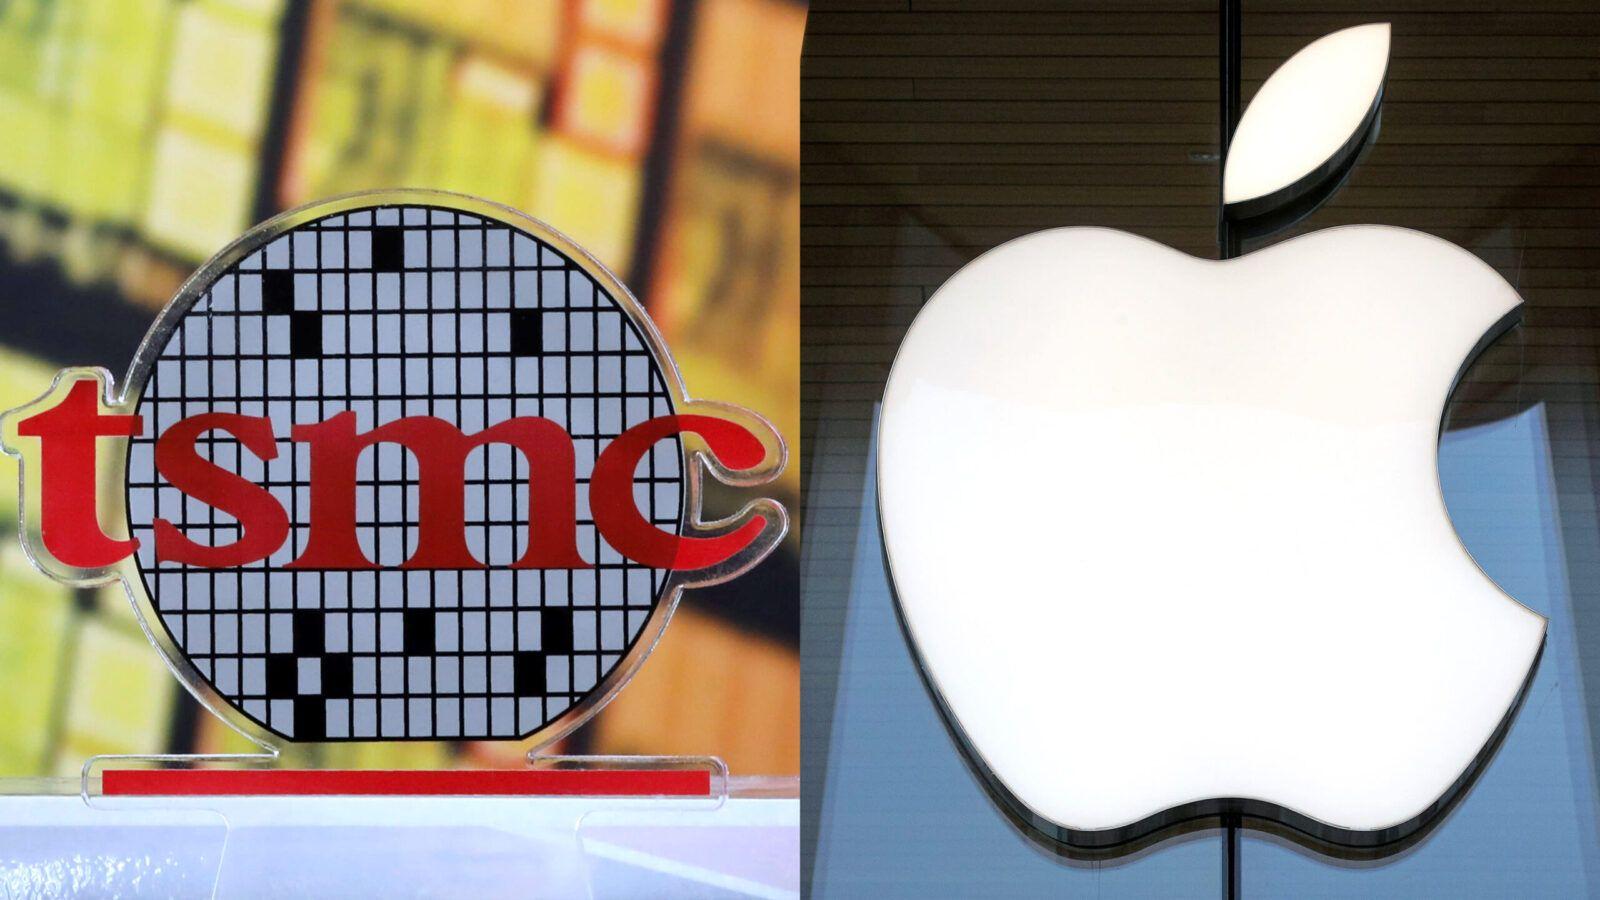 Apple сотрудничает с TSMC в разработке микро-OLED-дисплеев для очков (apple tsmc scaled)